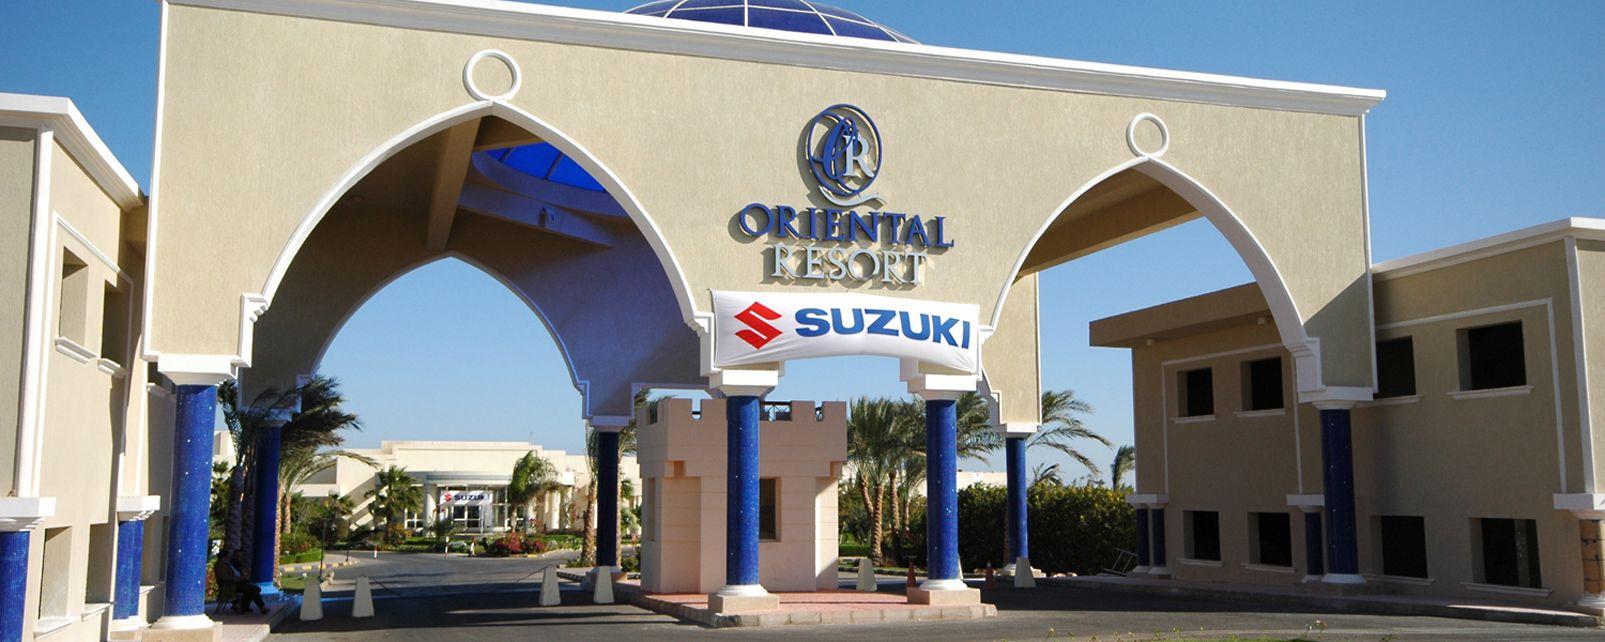 Hotel Hostmark Oriental Resort